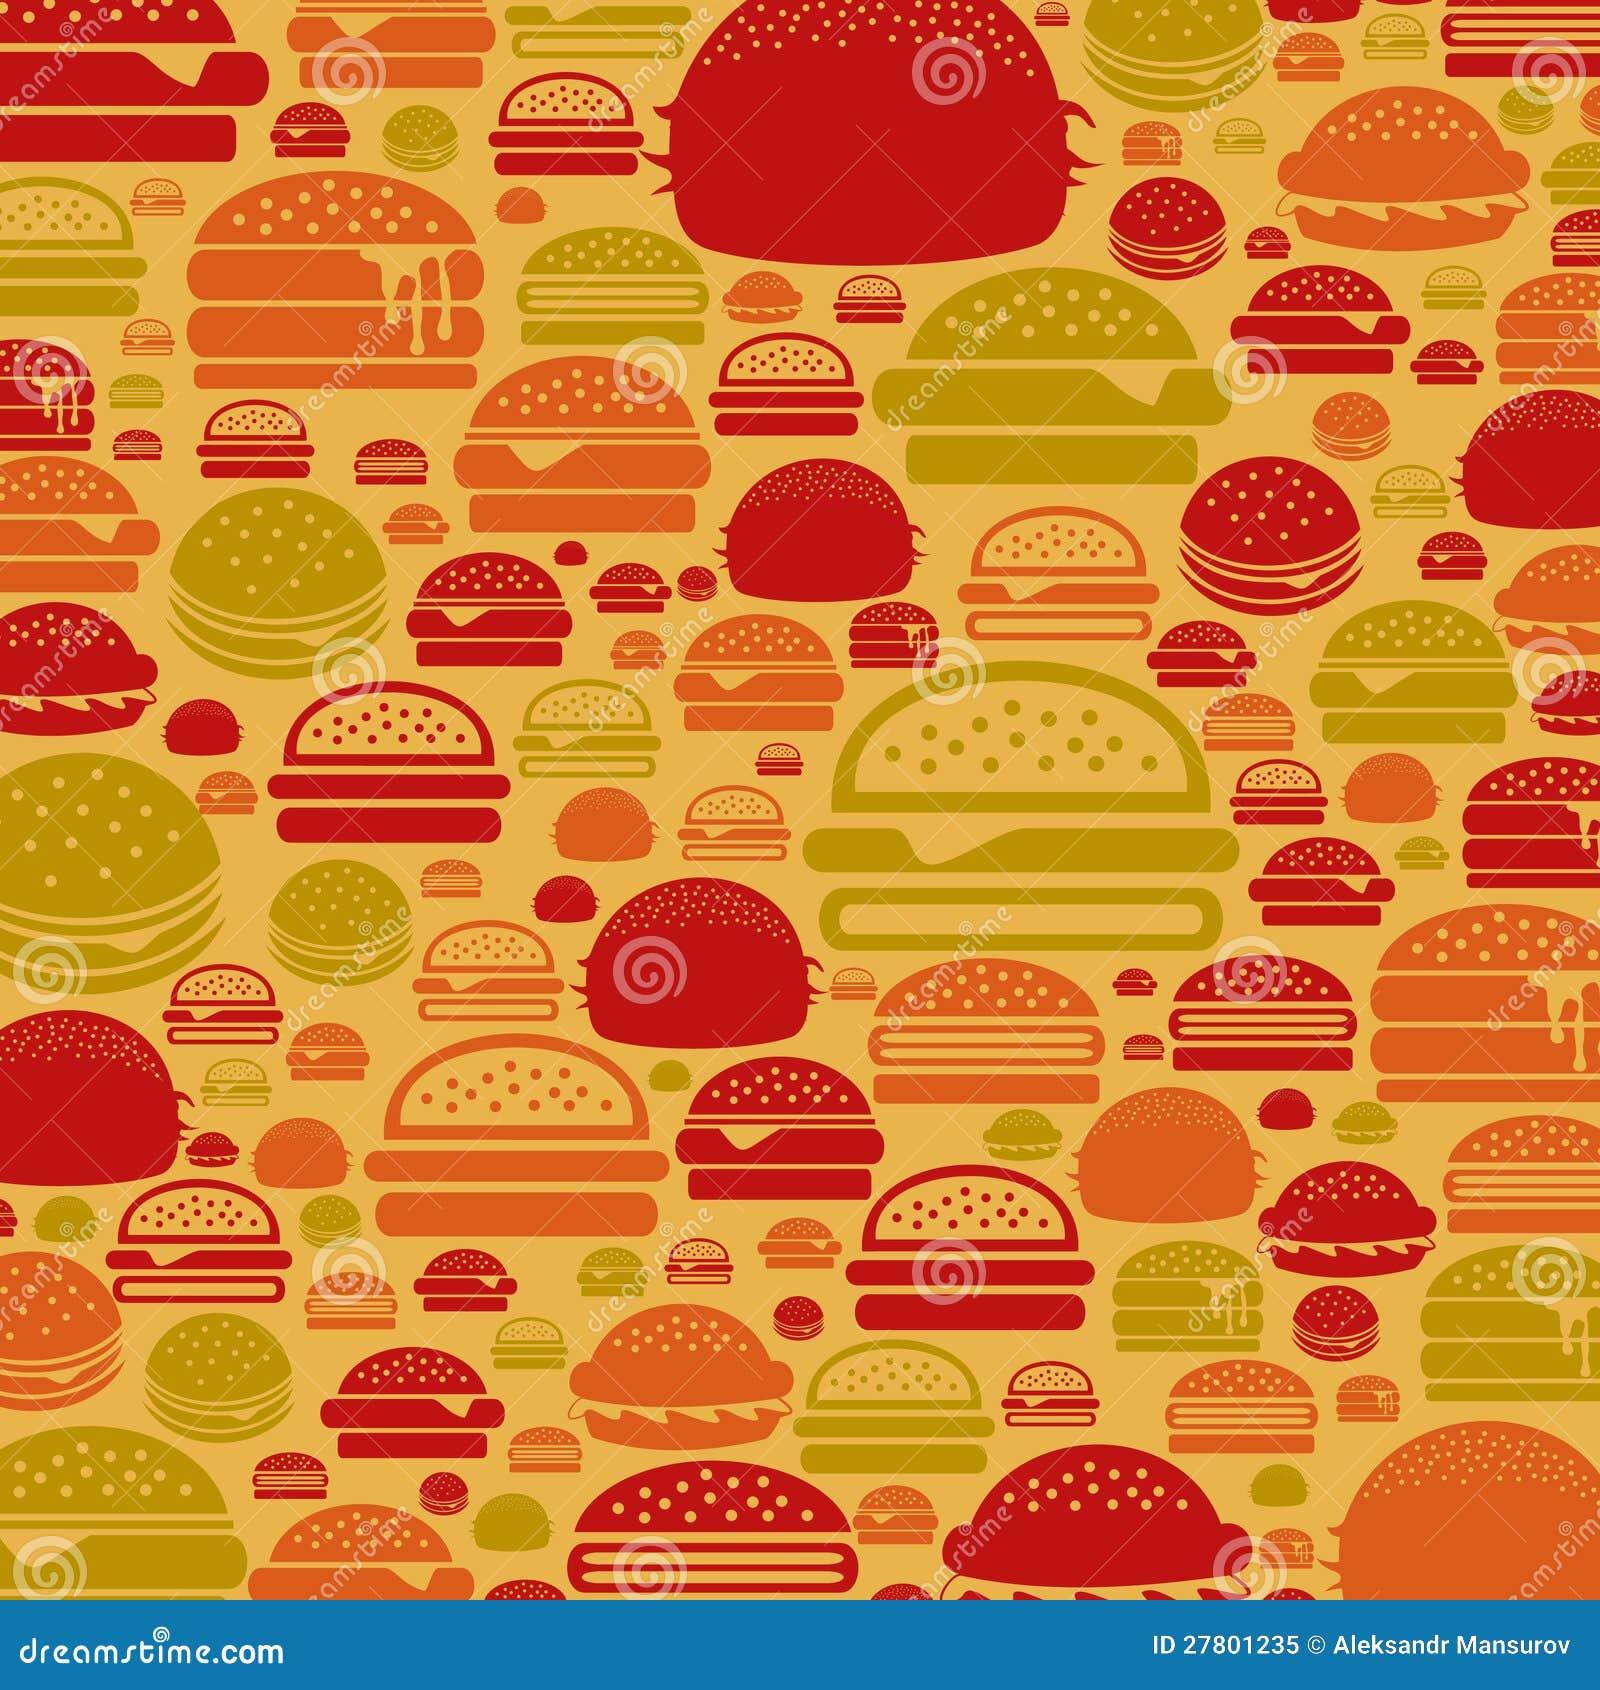 Hamburger A Background Royalty Free Stock Photo - Image: 27801235 French Menu Clipart